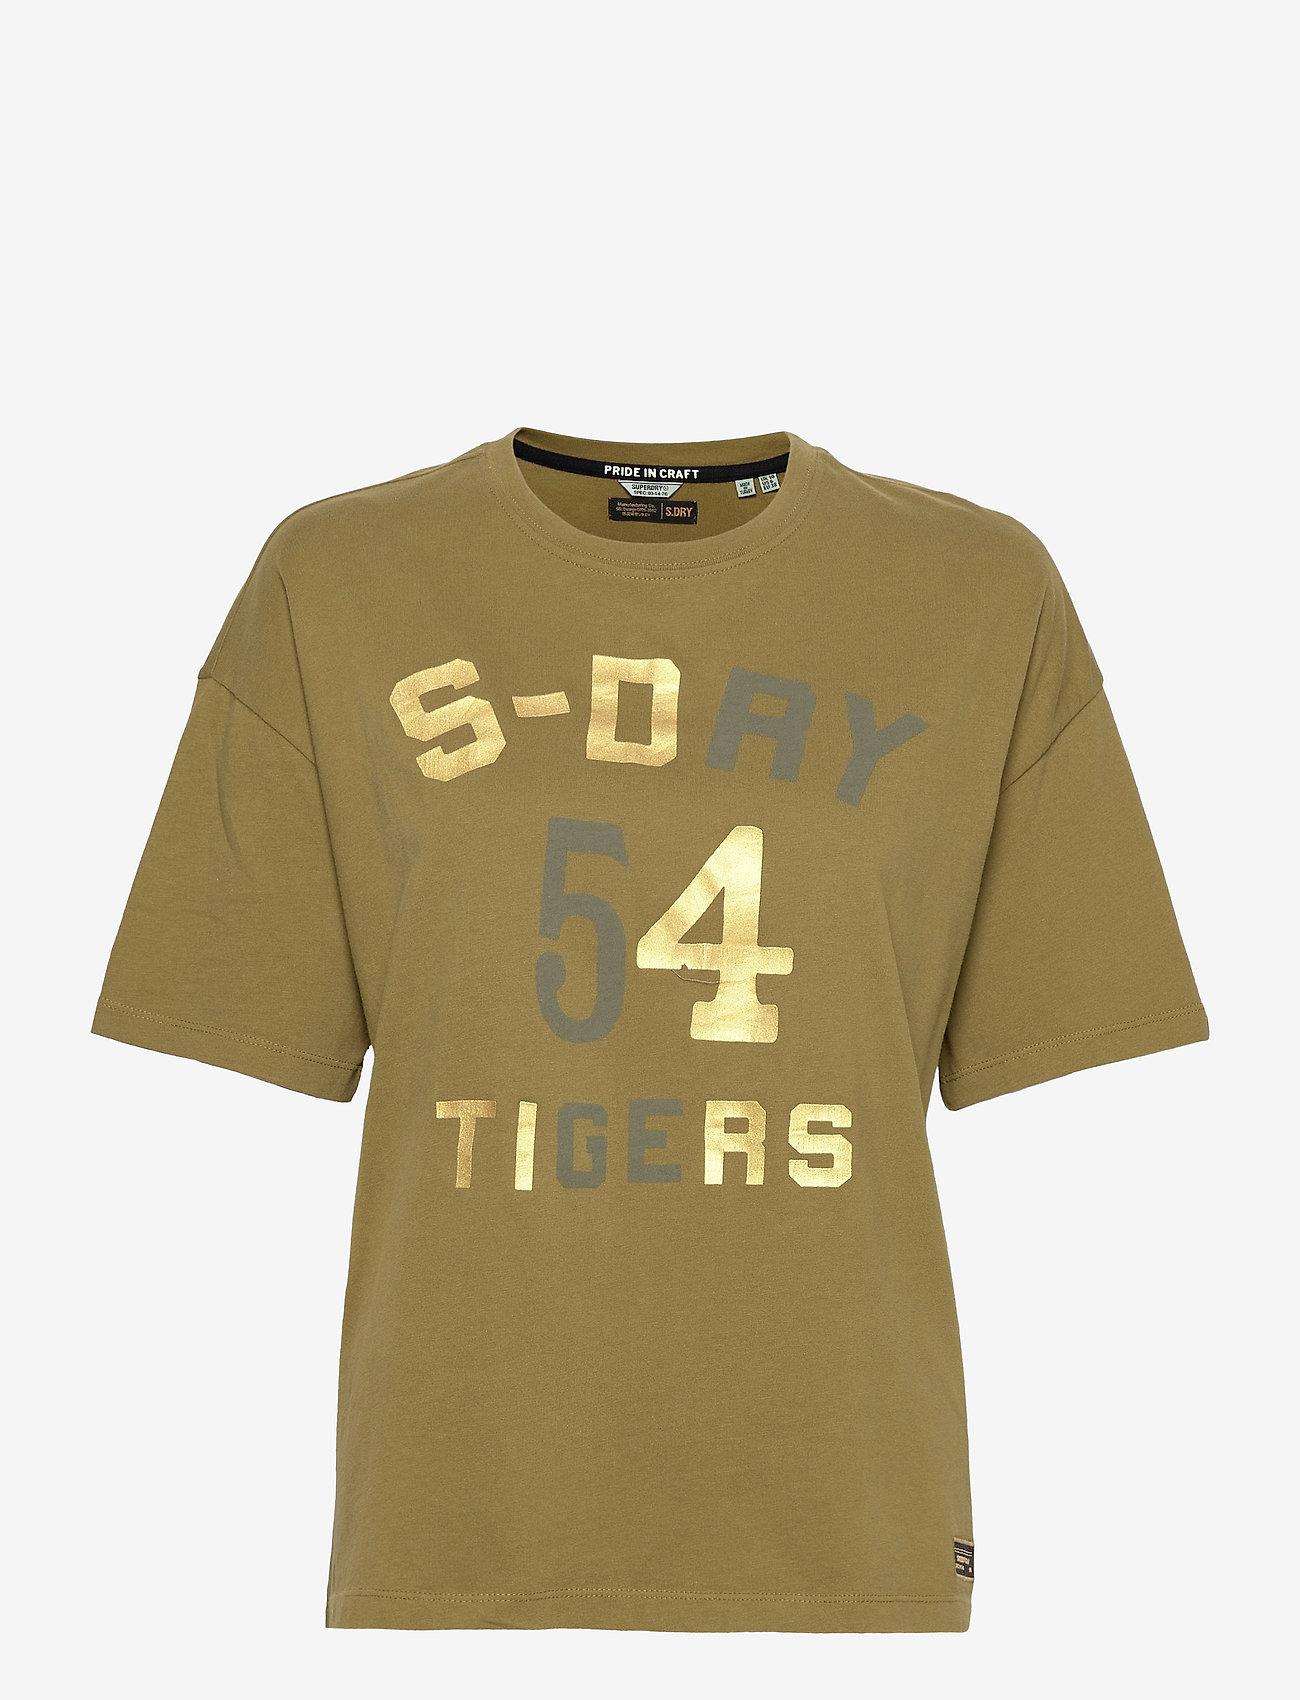 Superdry - MILITARY NARRATIVE BOXY TEE - t-shirts - shrubbery - 0